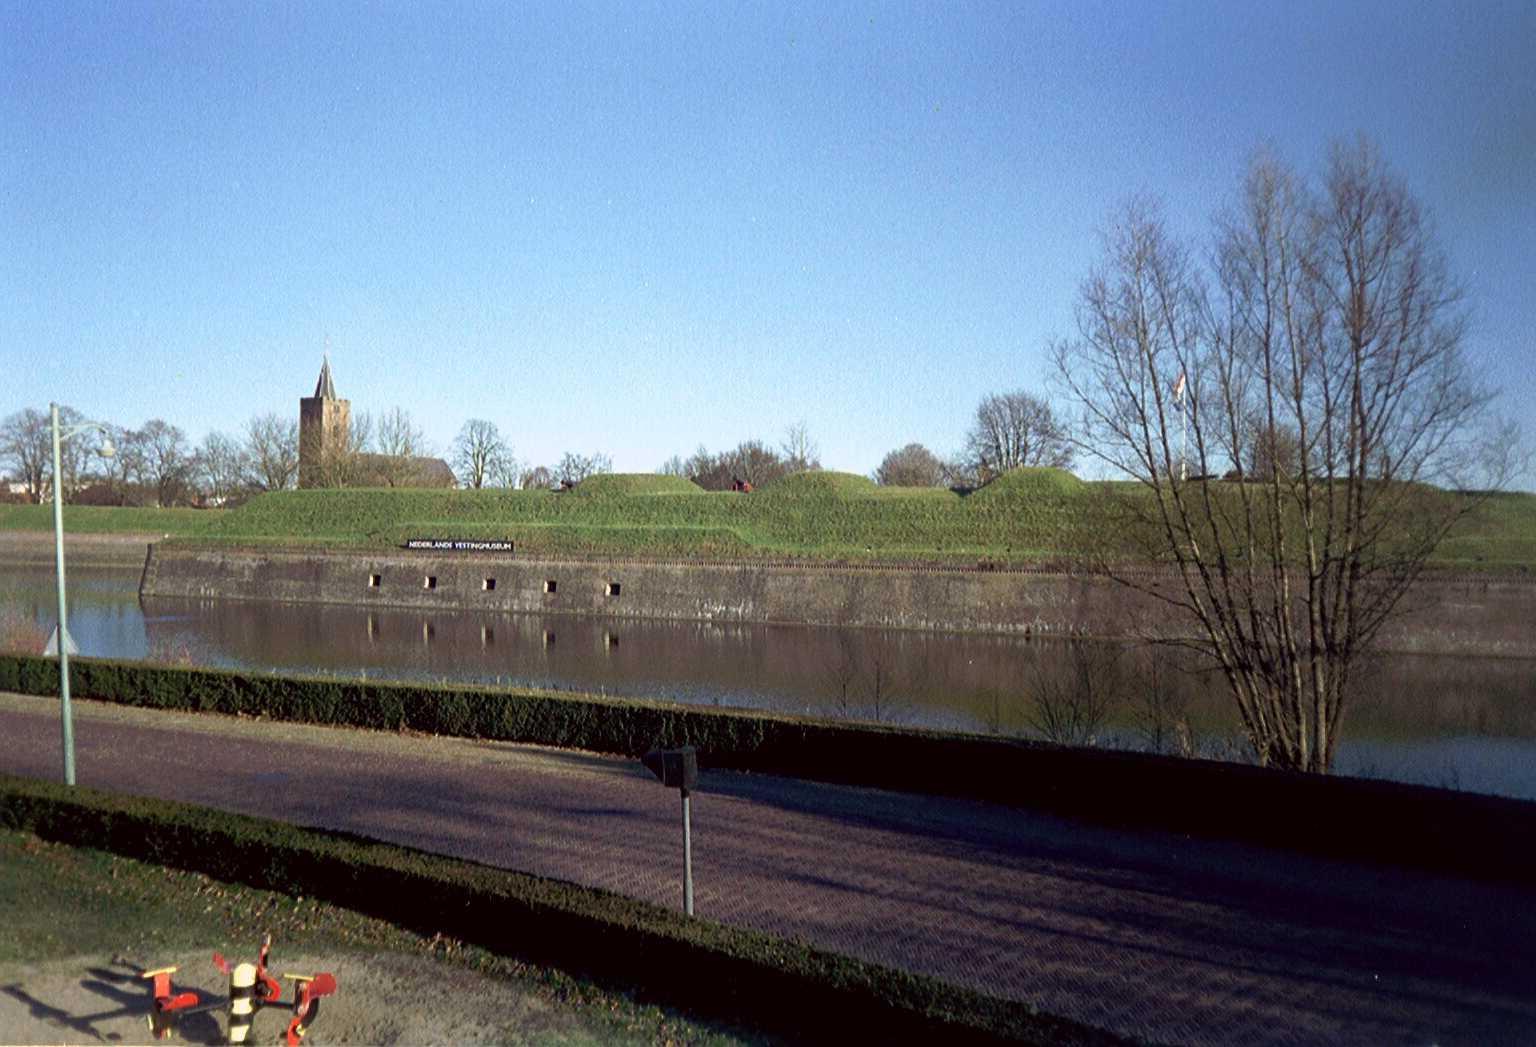 File:Wallen Naarden-Vesting2.jpg - Wikimedia Commons: commons.wikimedia.org/wiki/file:wallen_naarden-vesting2.jpg